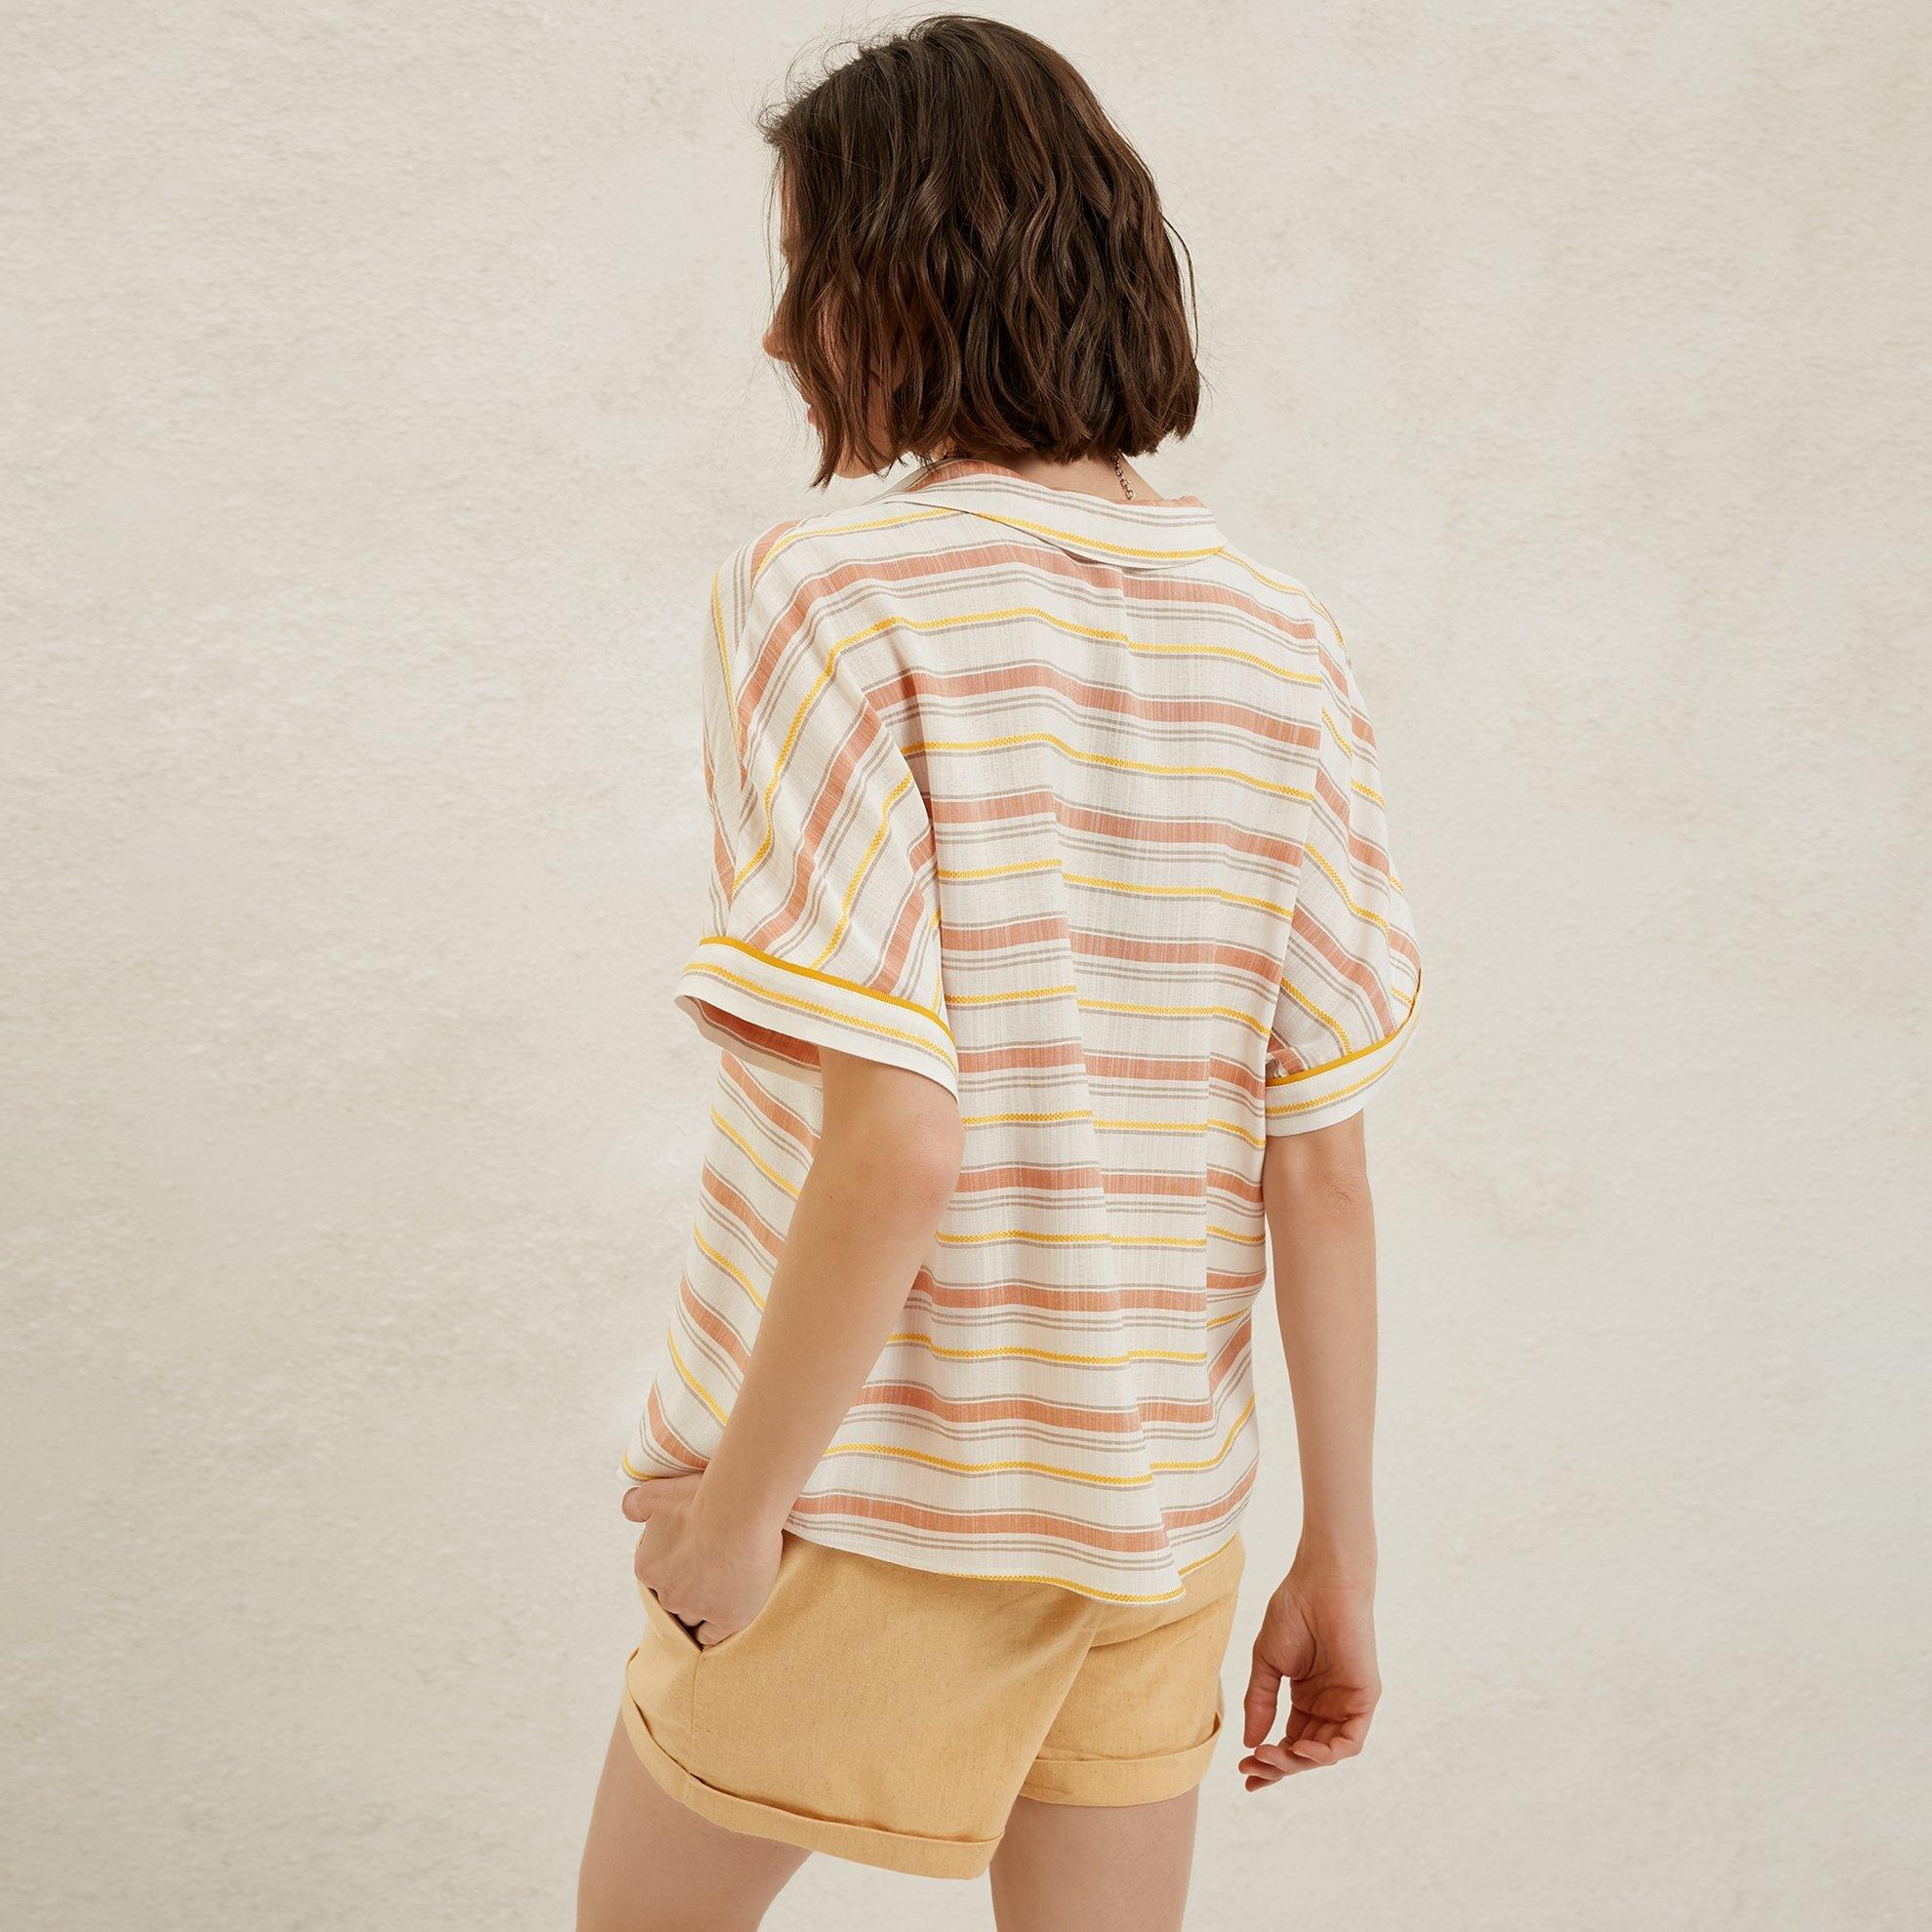 Shirt Sleeve Blouse